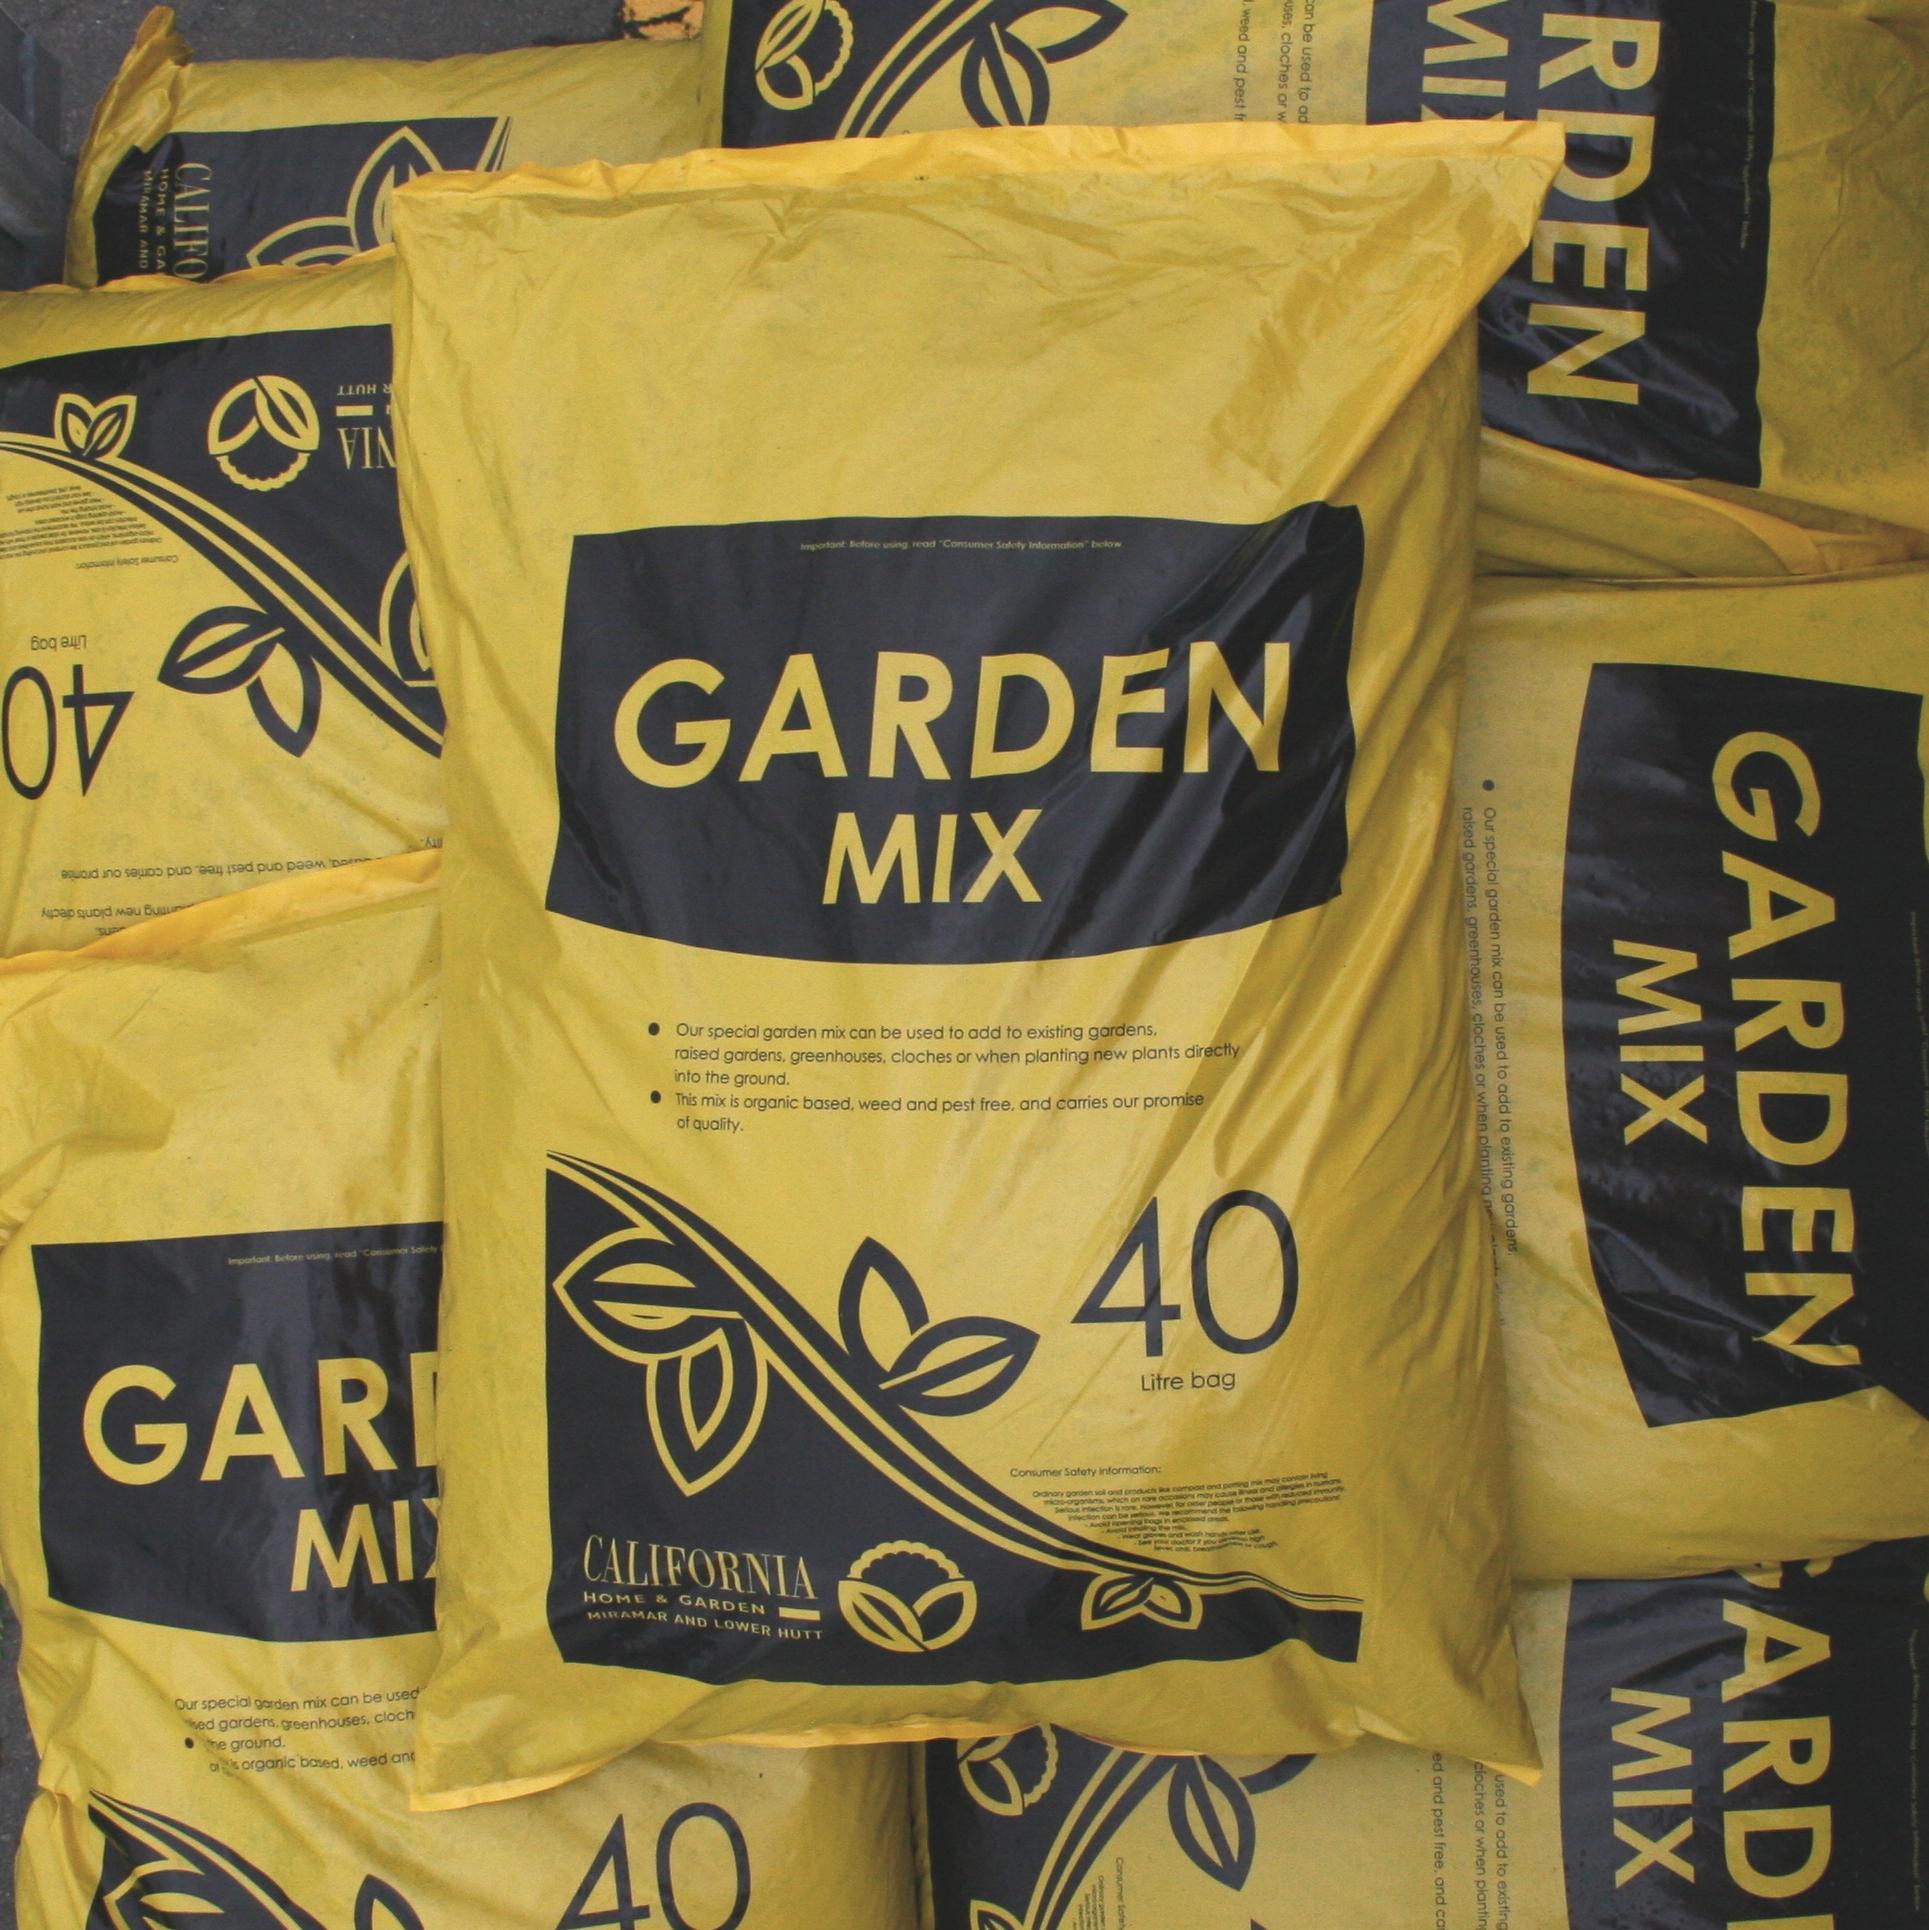 California Garden Mix 40L3 for $27 -